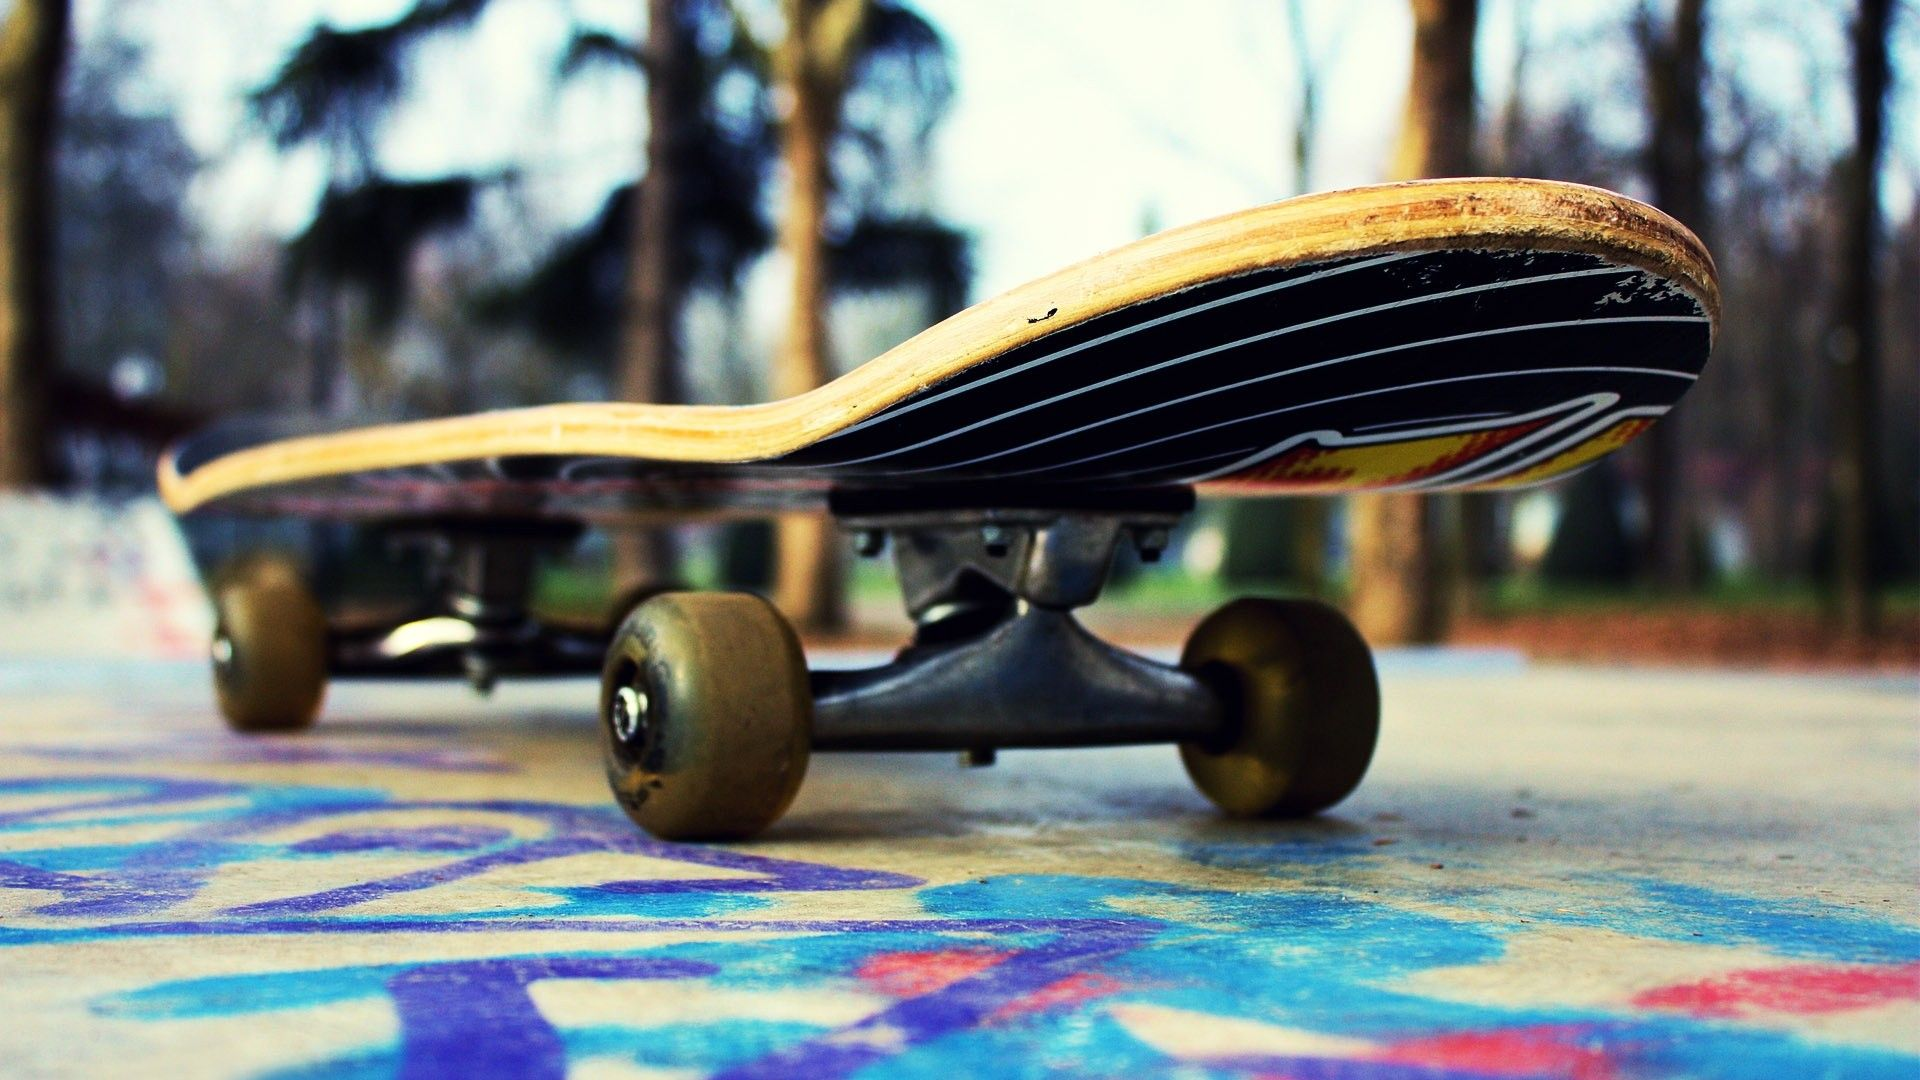 skateboard wallpaper 7544 Skateboard